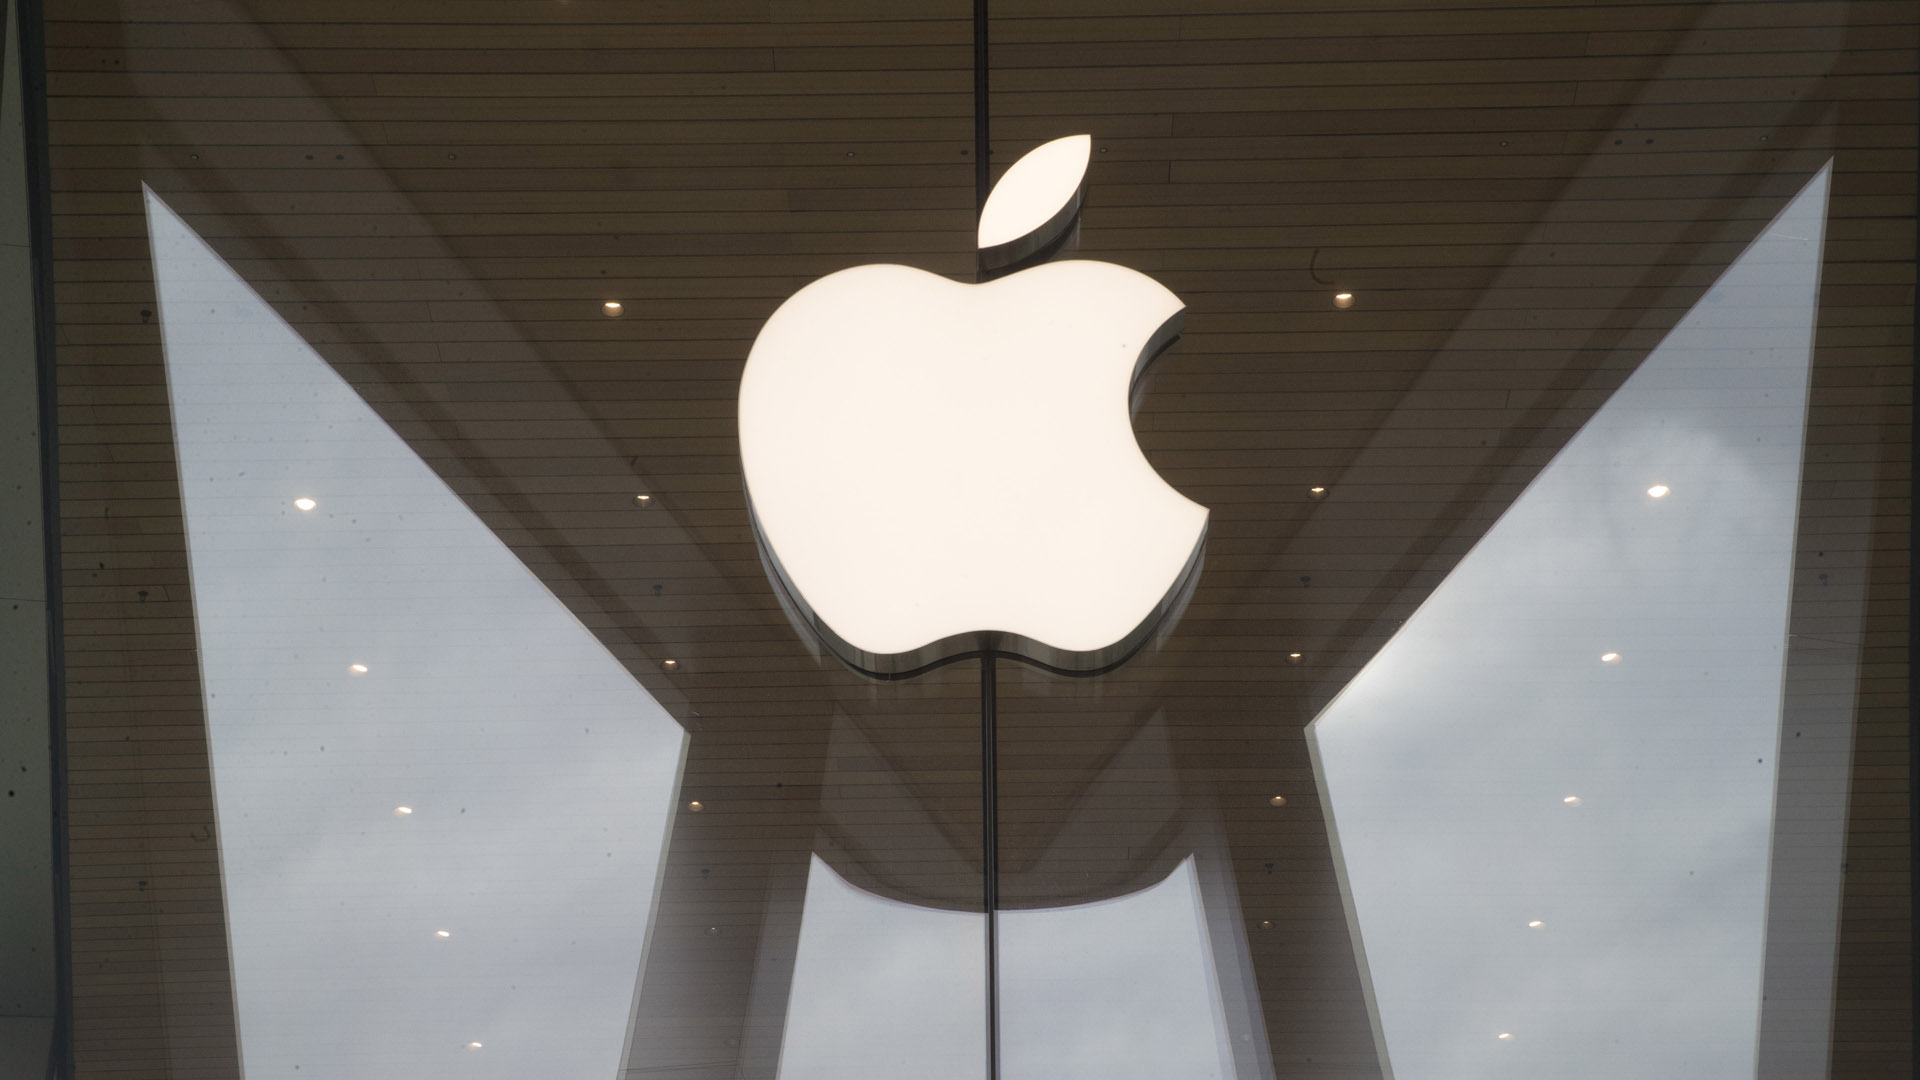 generic apple logo _1546561548166